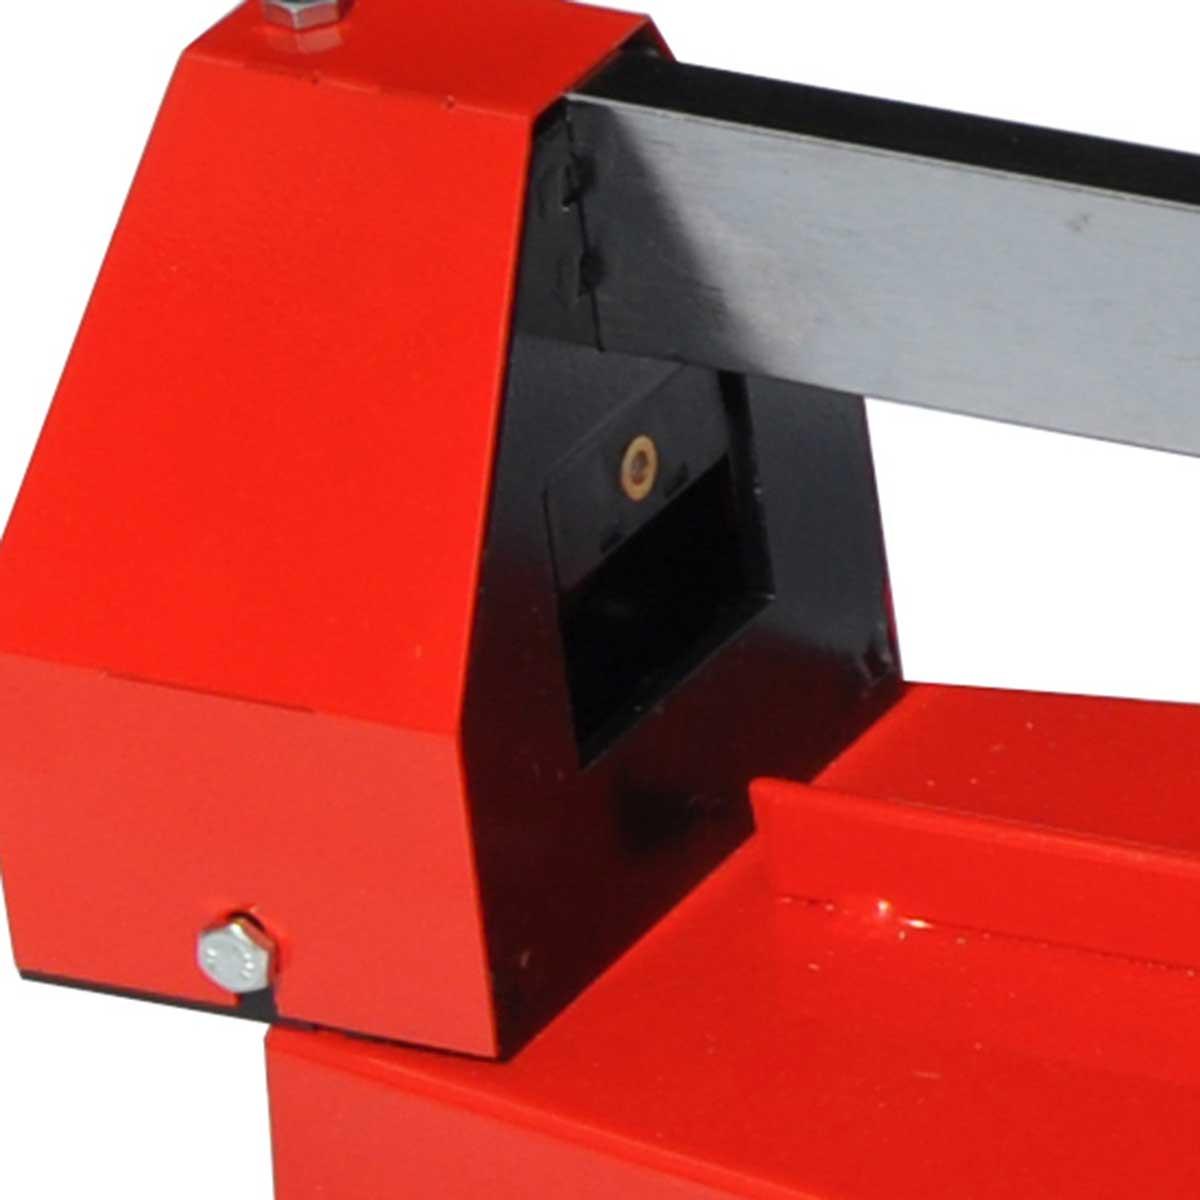 Kristal Giga-cut tile cutter laser